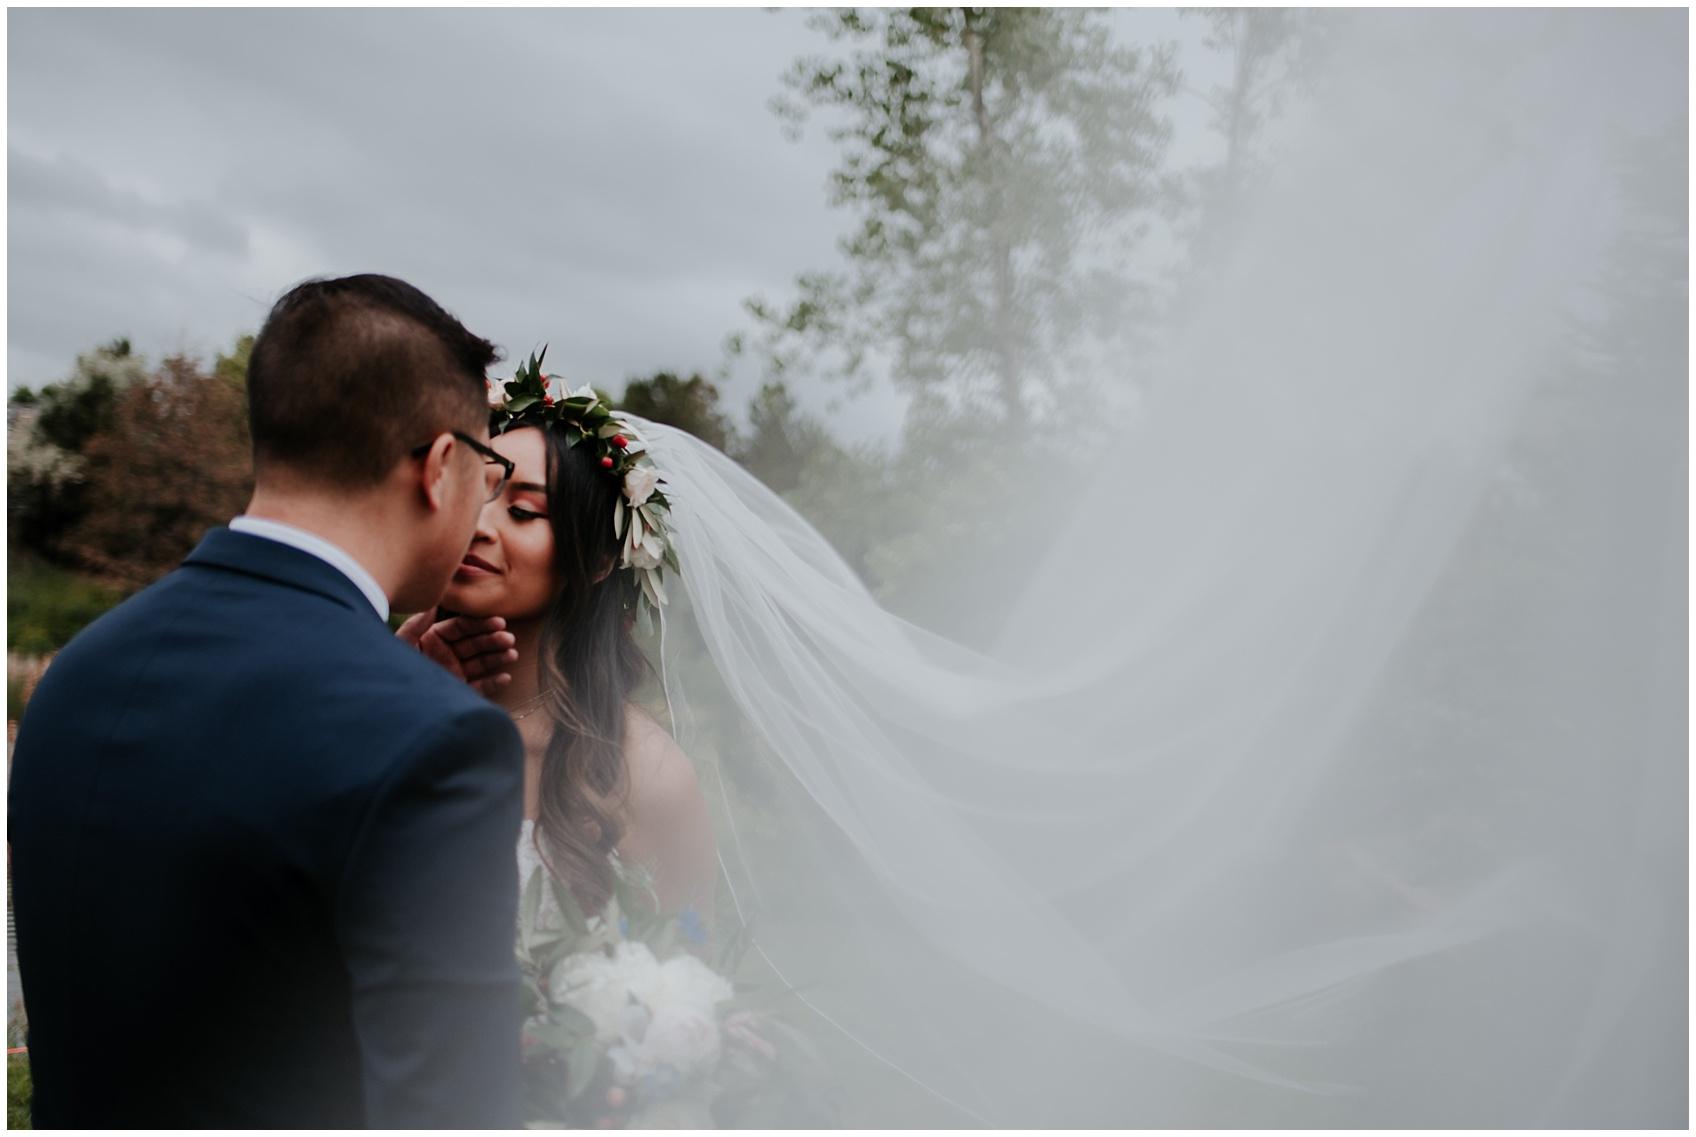 lakewood wedding, baldoria on the lake wedding, denver wedding photographer, colorado wedding photographer, denver videographer, colorado videographer, Vietnamese wedding, periwinkle blue wedding, floral crown